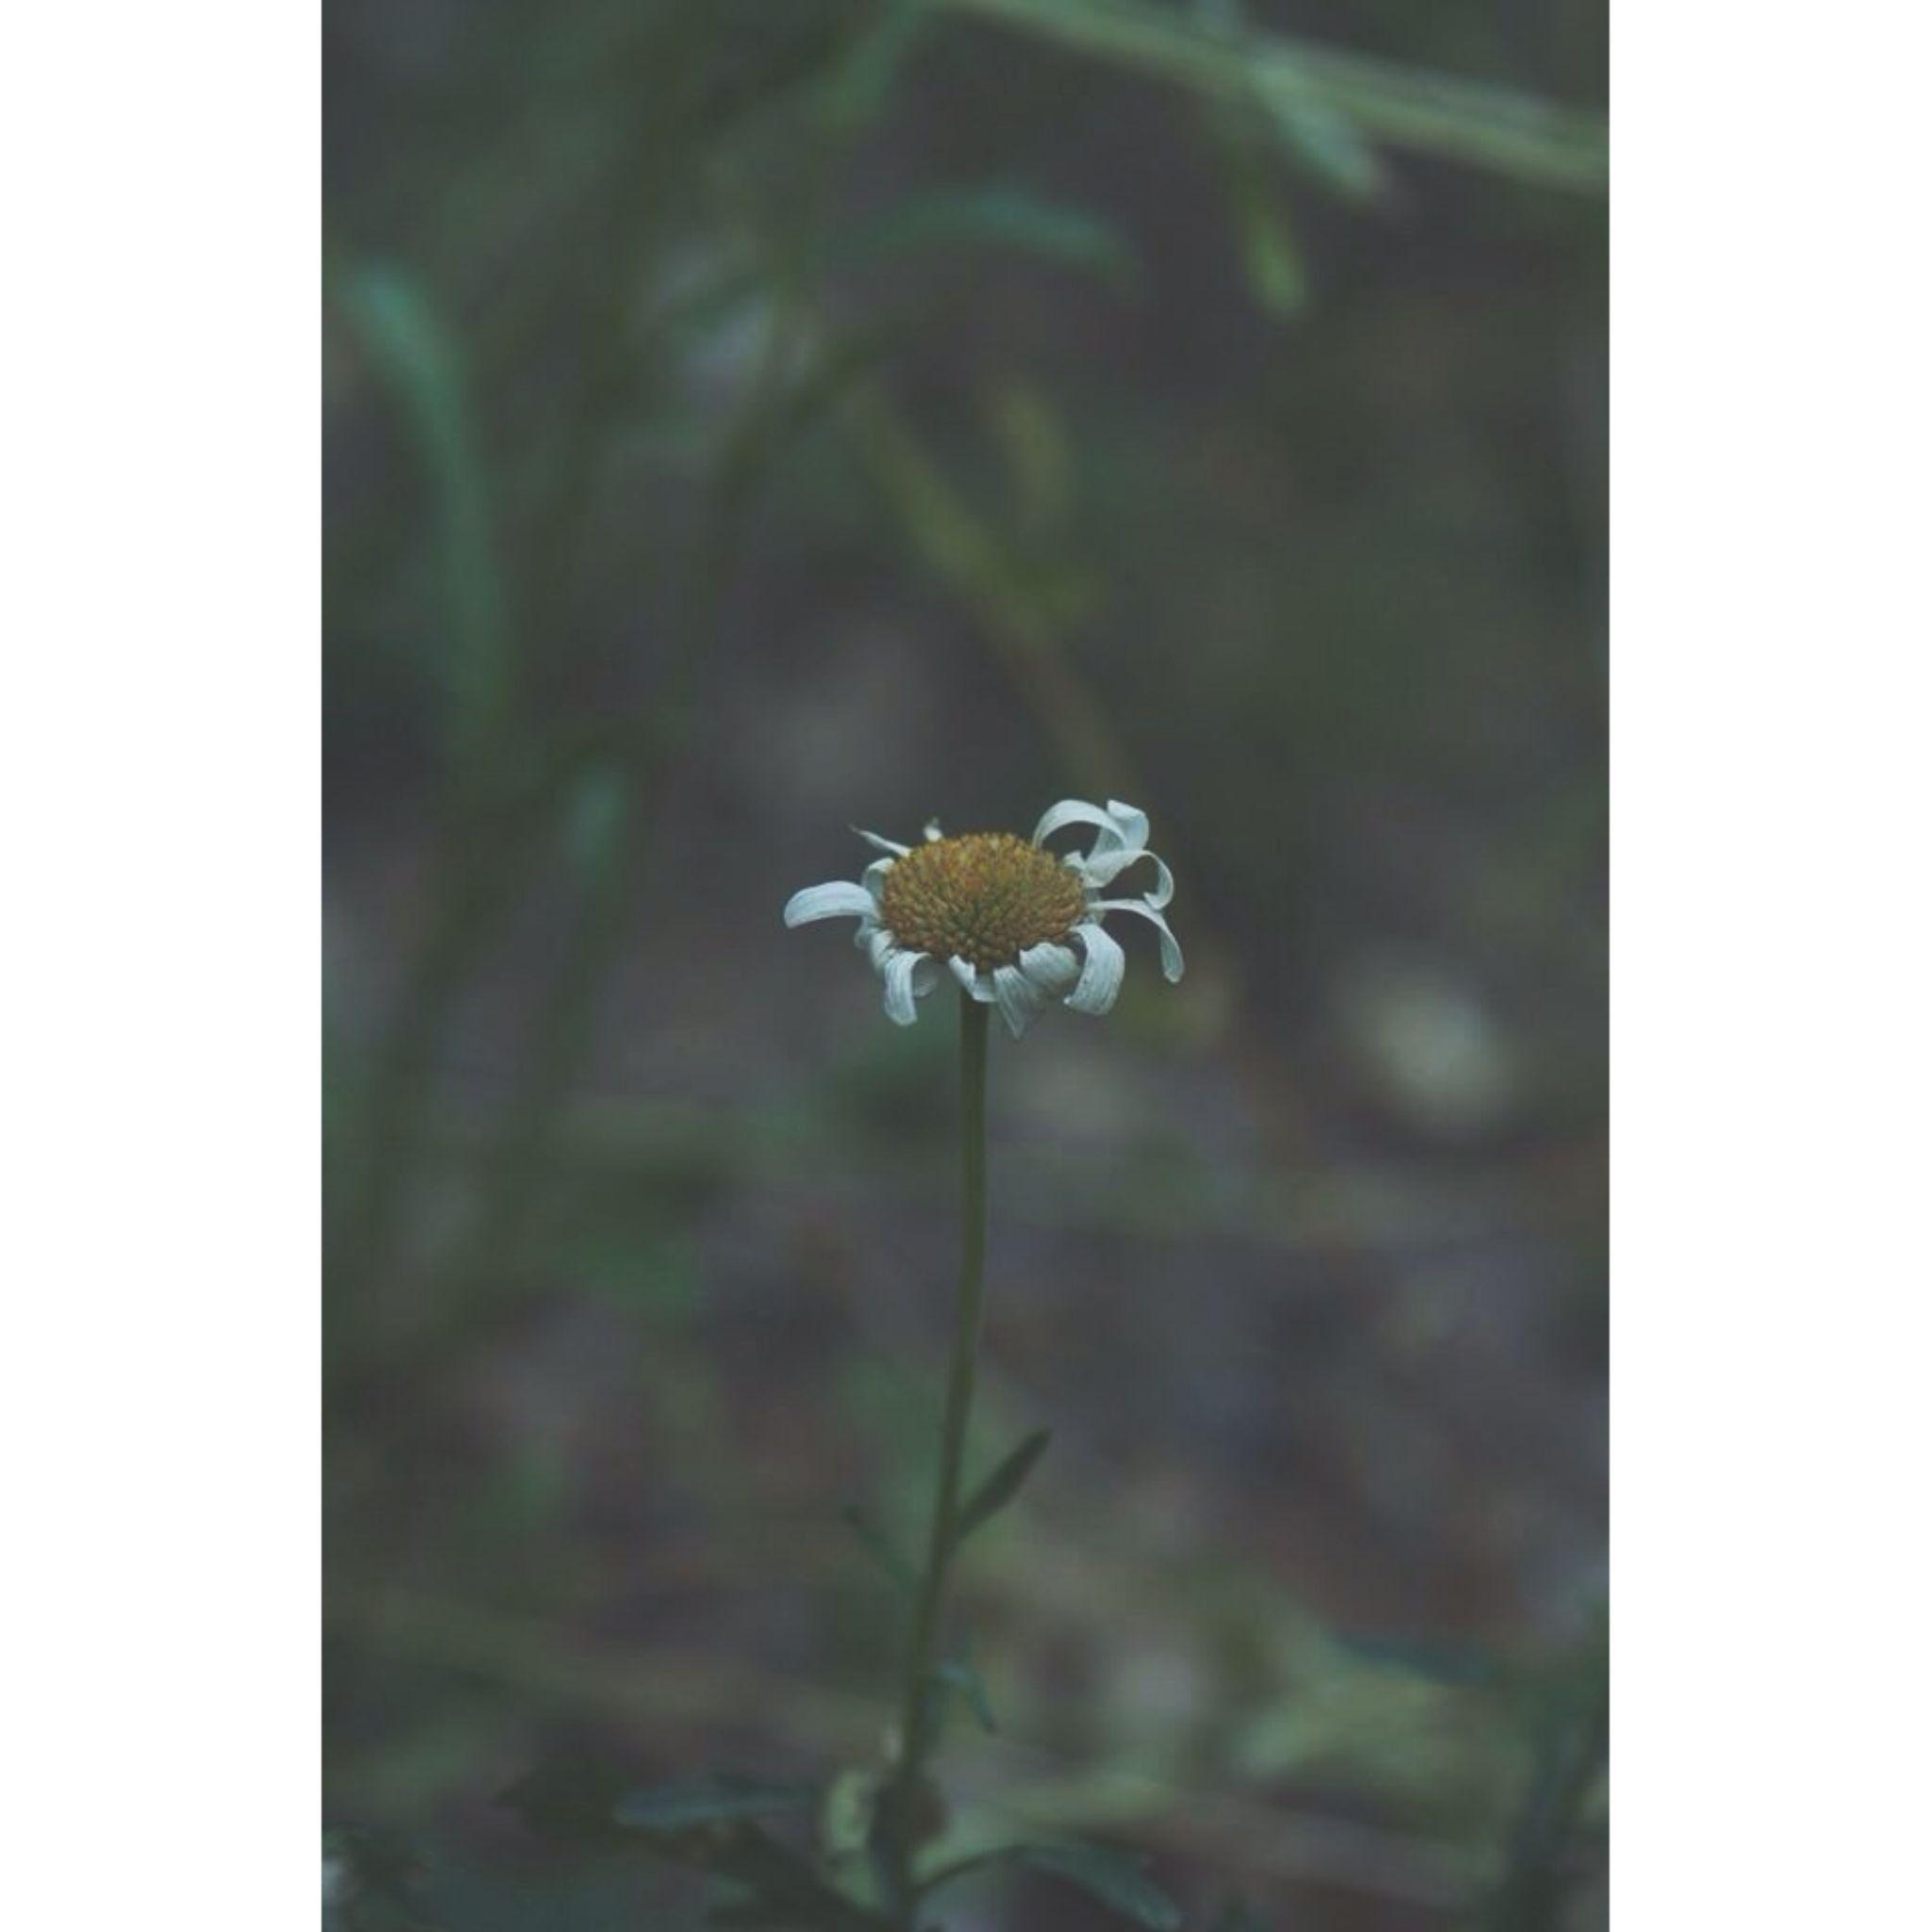 The Lonely Flower by Tessah Belcher